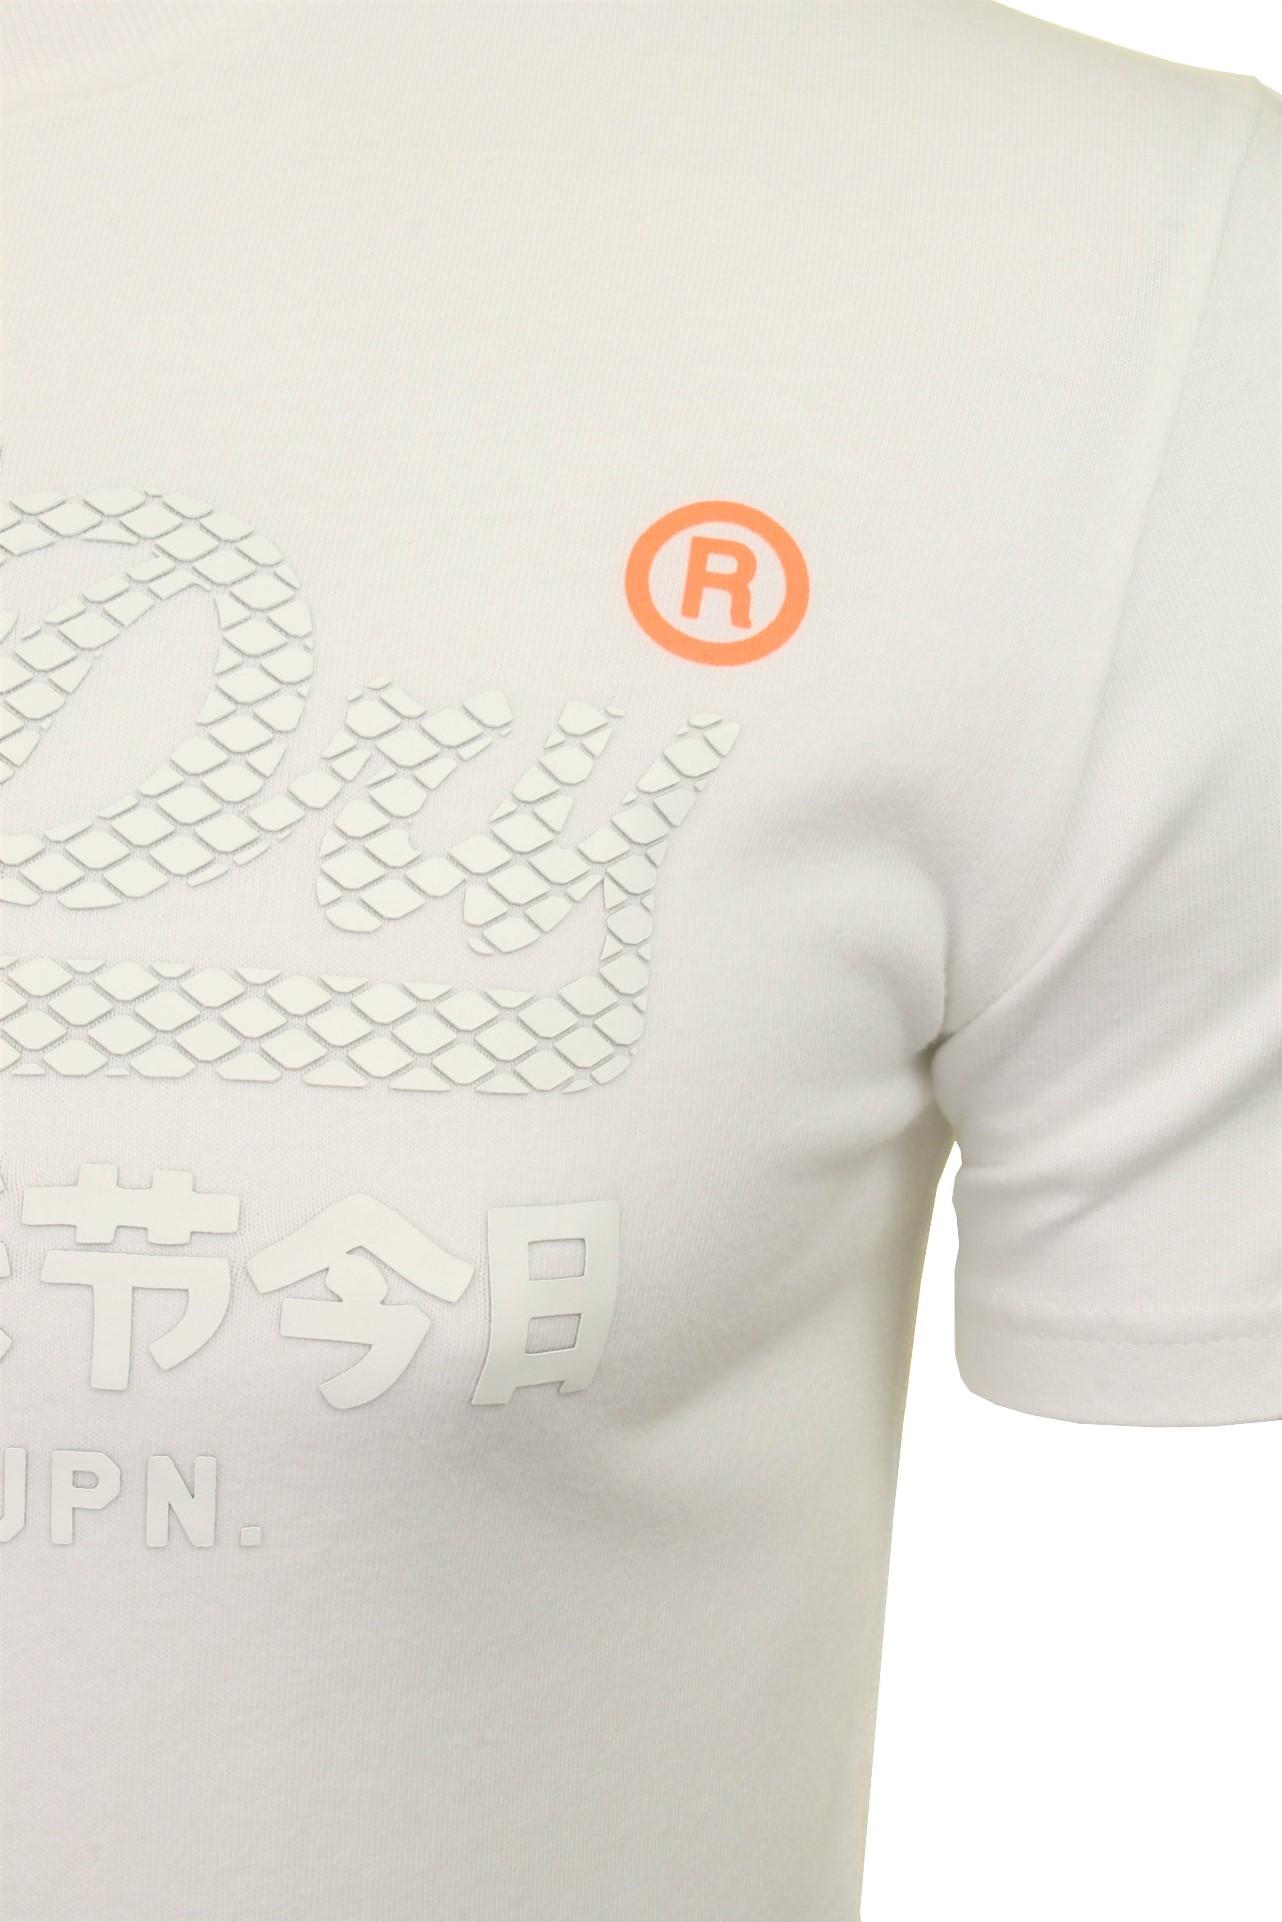 Superdry-039-Monochrome-039-Mens-T-Shirt thumbnail 7